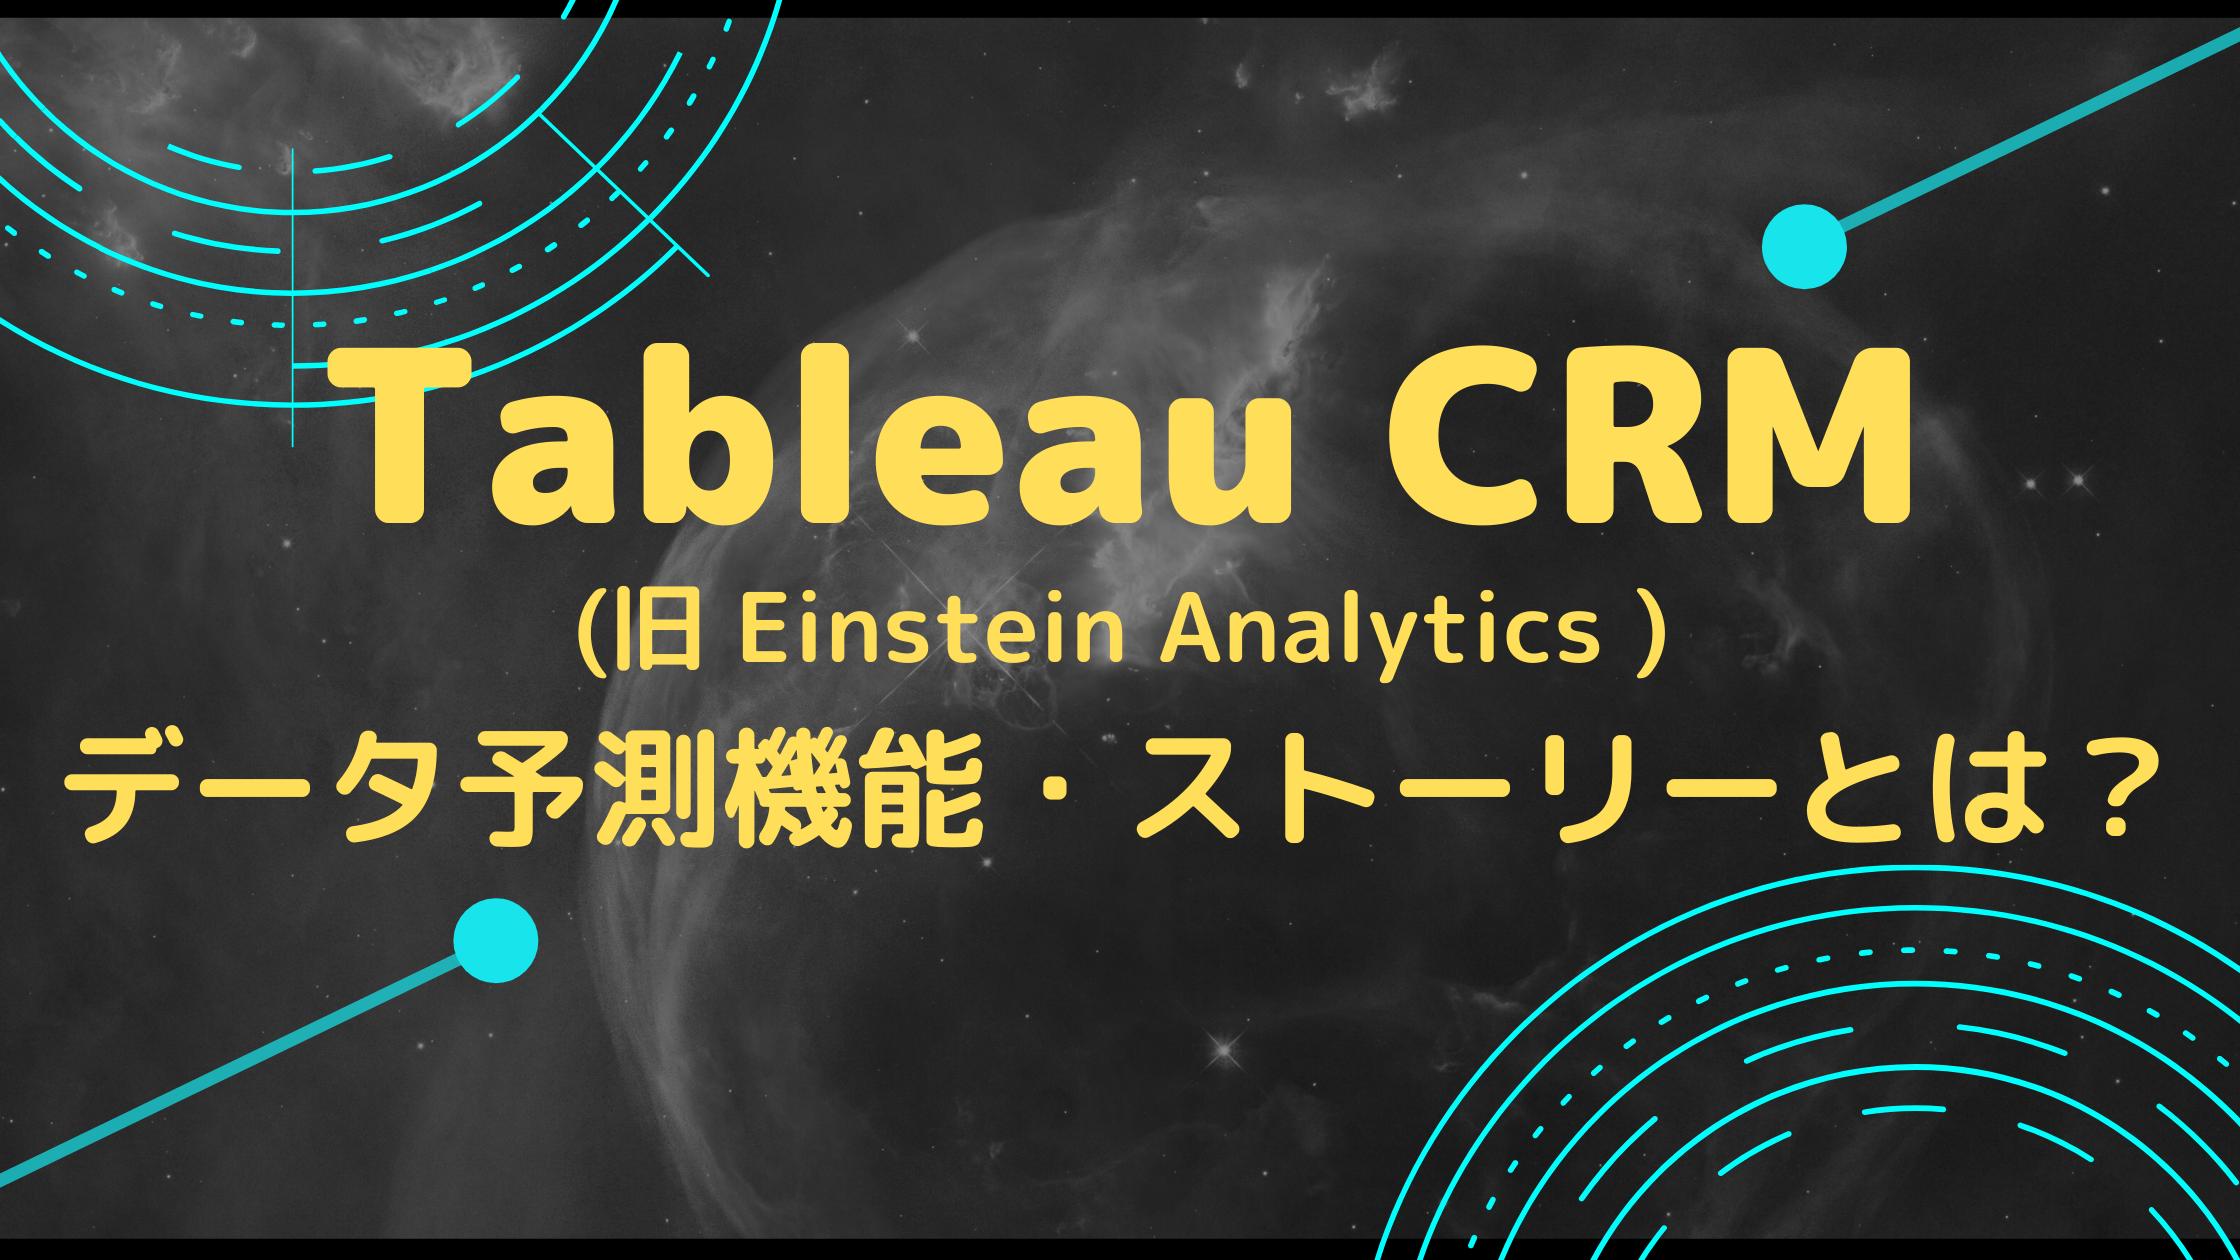 AIで高度な分析結果を!Salesforceの機能「Tableau CRM (旧 Einstein Analytics)」とは?